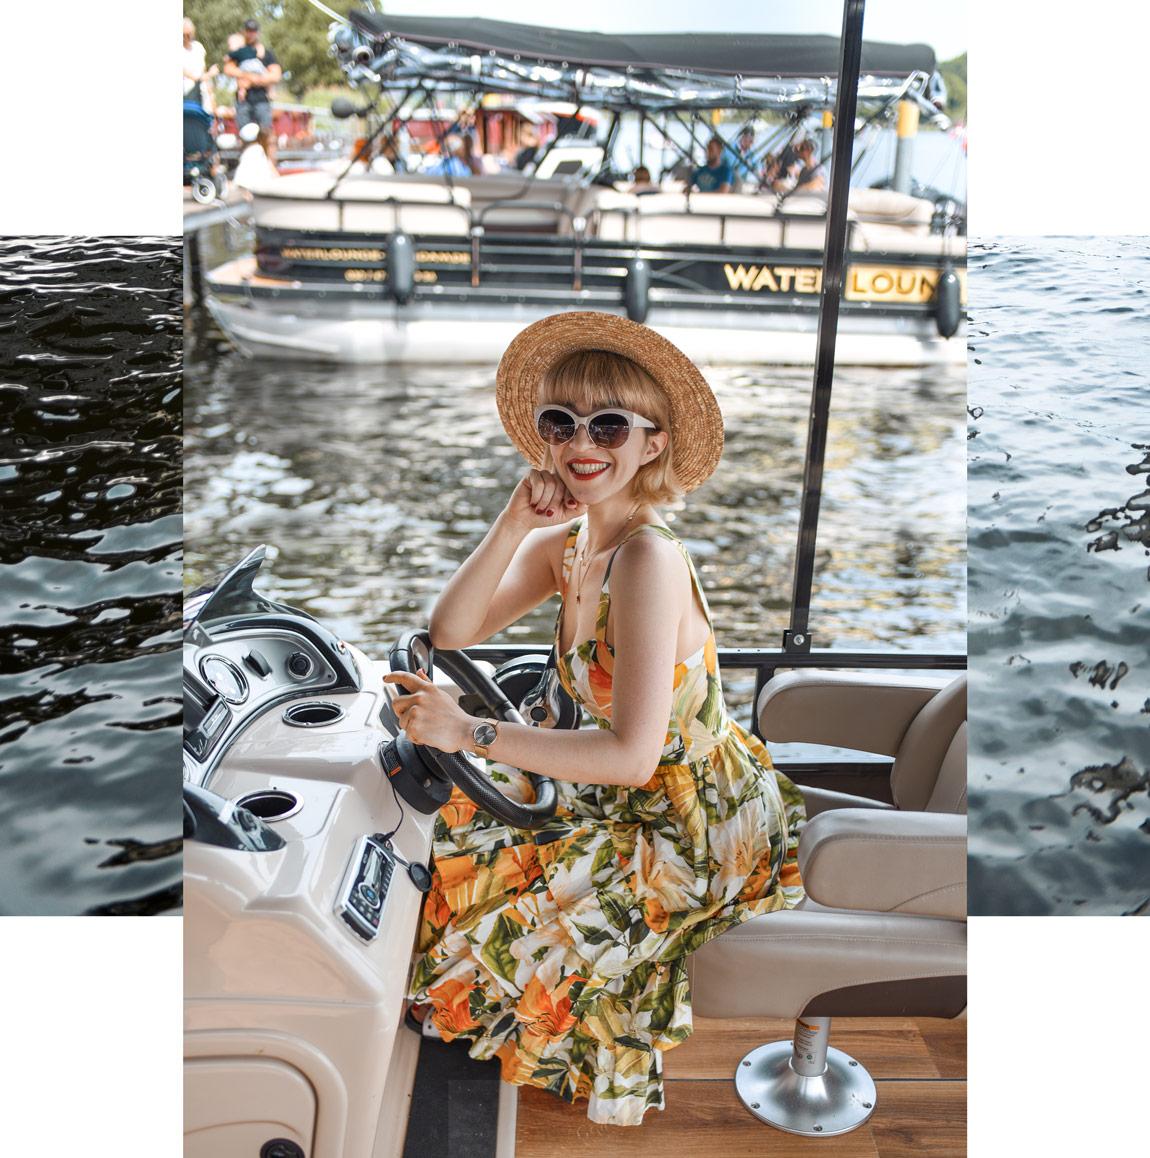 sommer, summer, inspiration, berlin, lifestyle, fashionblogger, modeblogger, pinterest, kleid, dress, strohhut, mohnfeld, unternehmen, tipps, brandenburg, ausflug, natur, naturelover